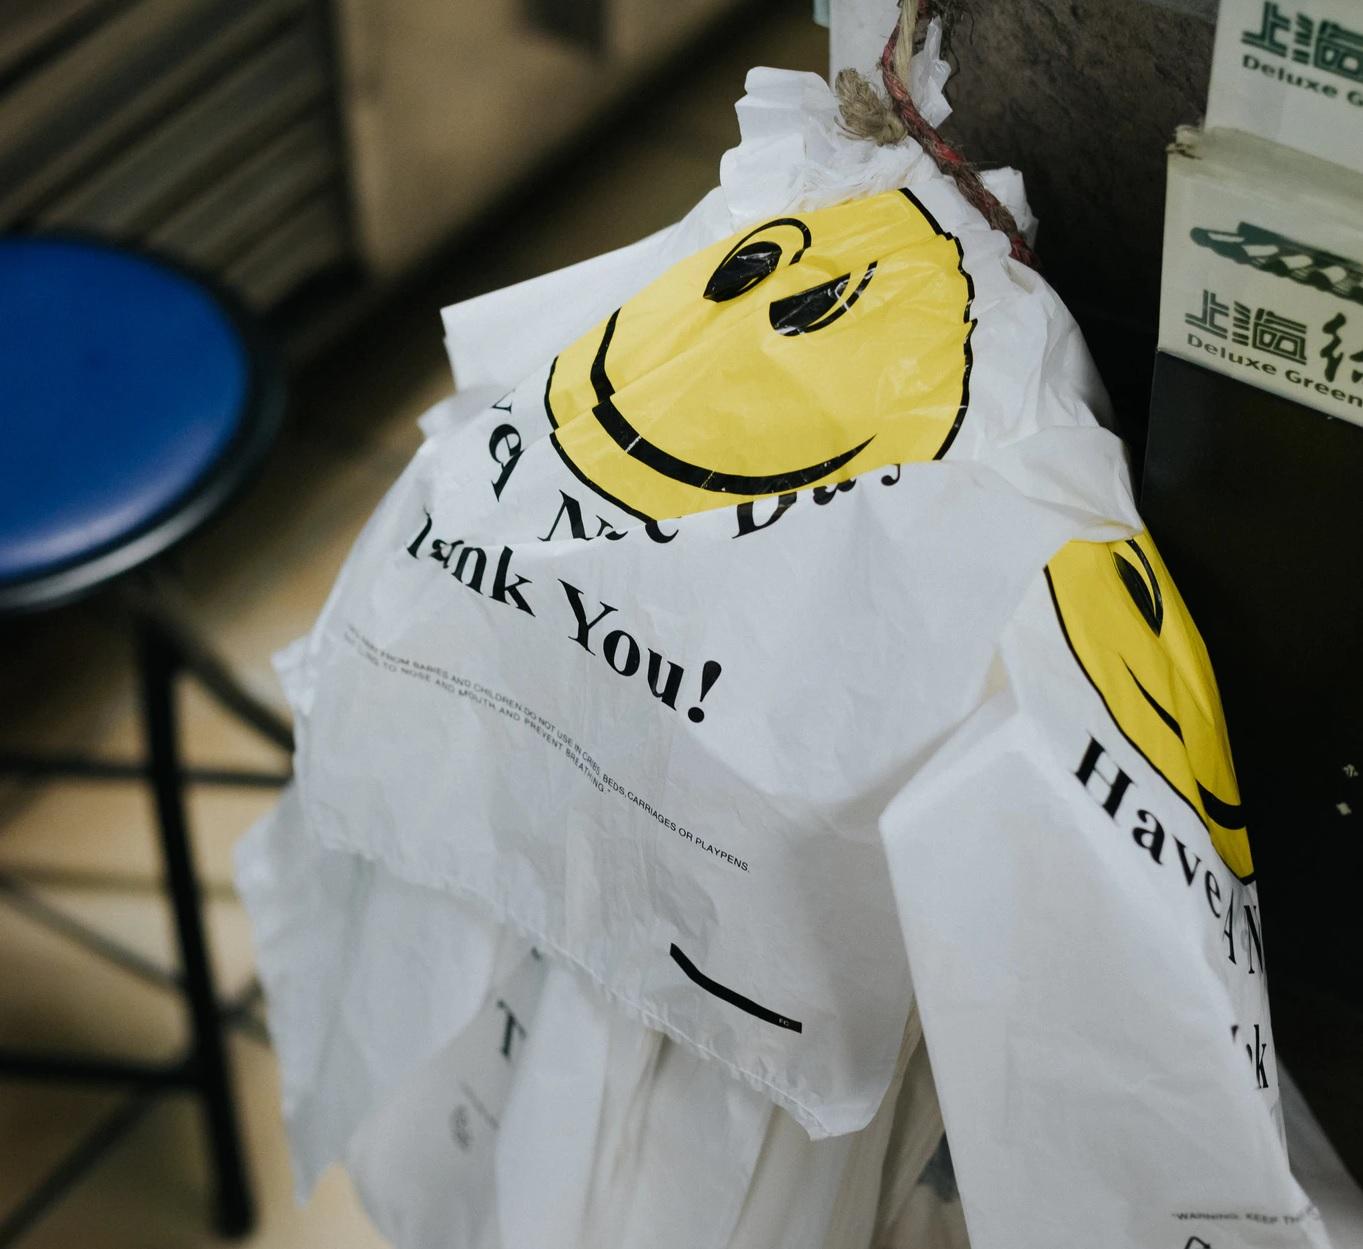 Pertanyaan yang Serung Diajukan Seputar Plastik Sablon